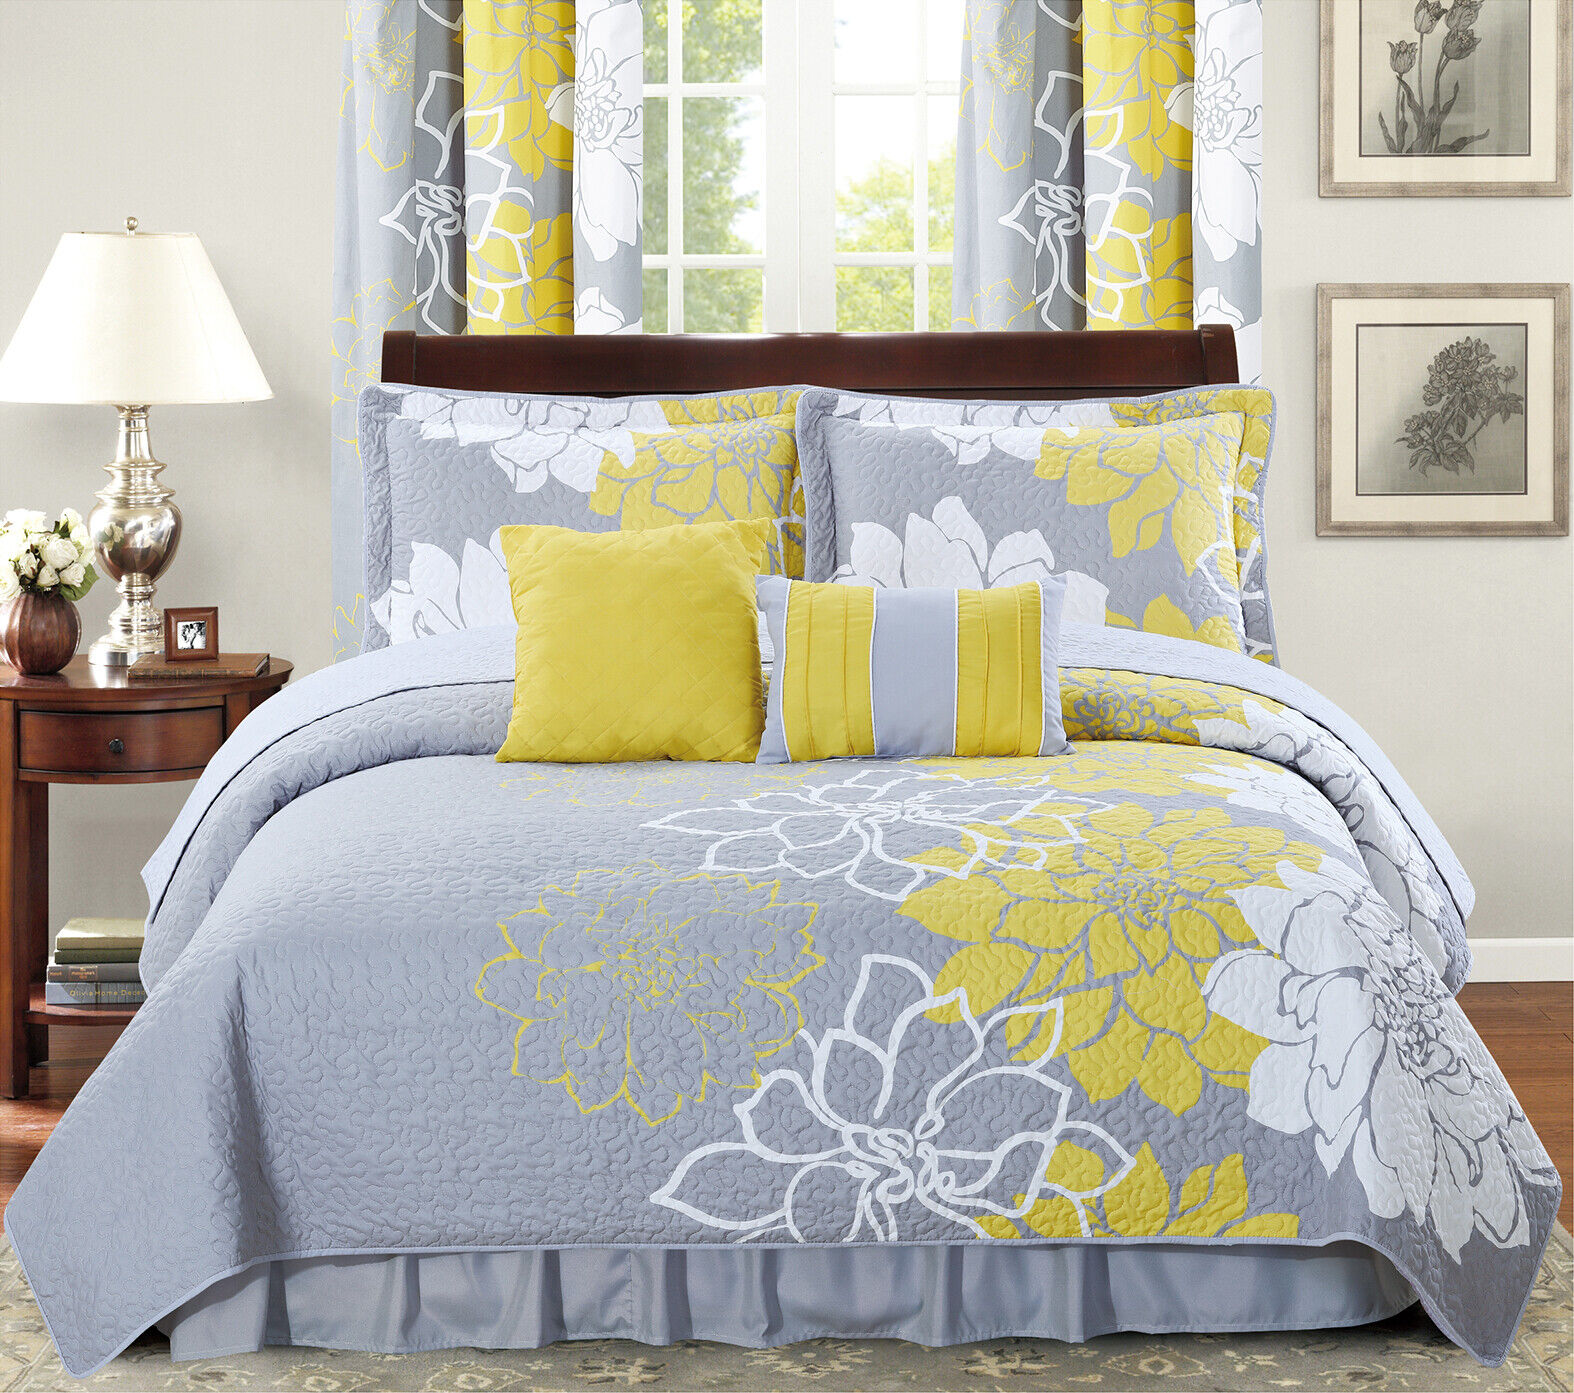 new 6 piece printed reversible bedspread set